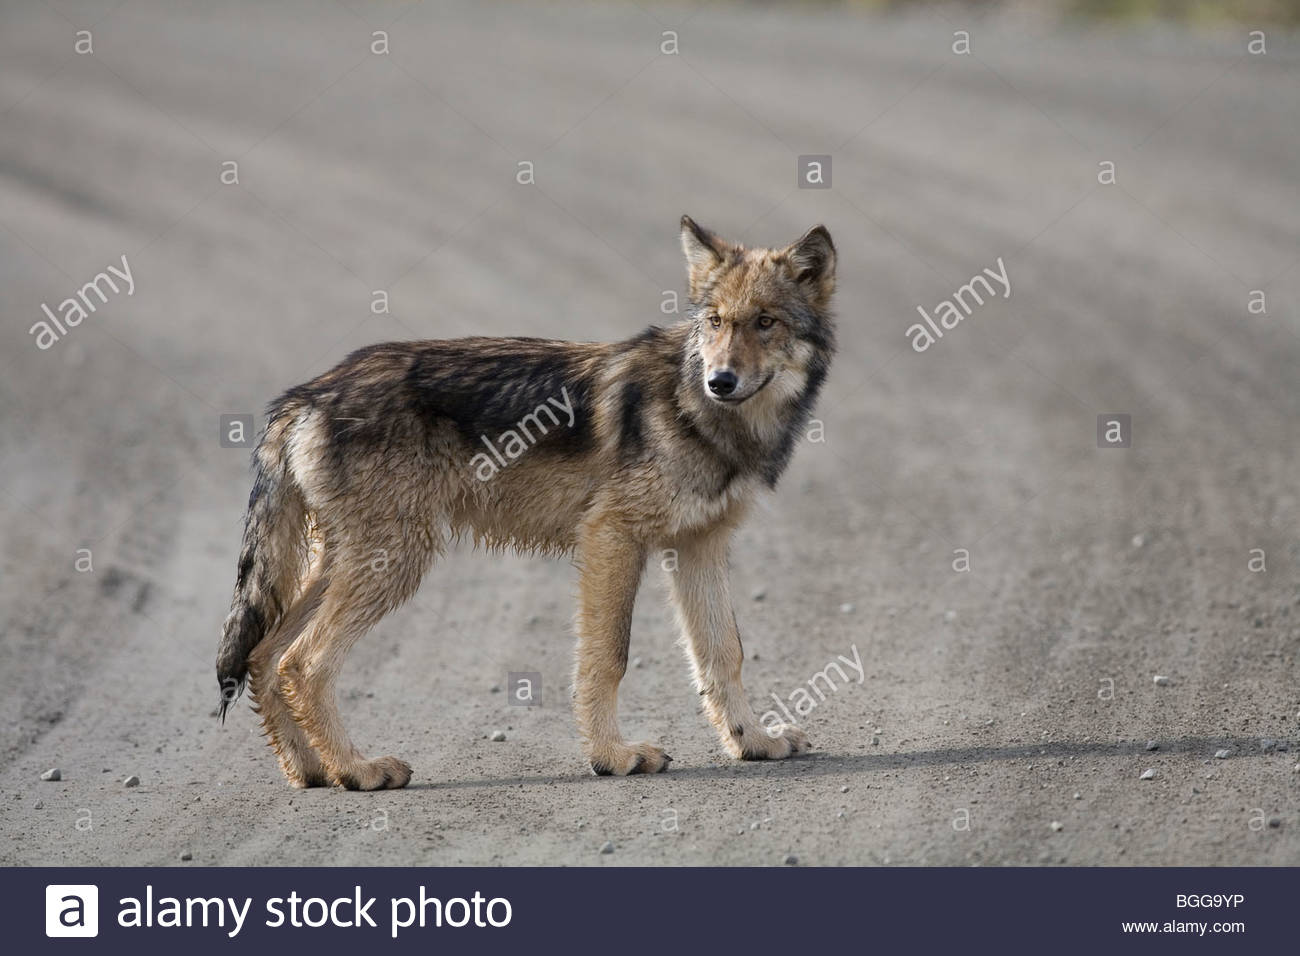 Wolf, Canis lupus, pup of Grant Creek pack, walking on dirt road, Denali National Park, Alaska, horizontal, wild Stock Photo